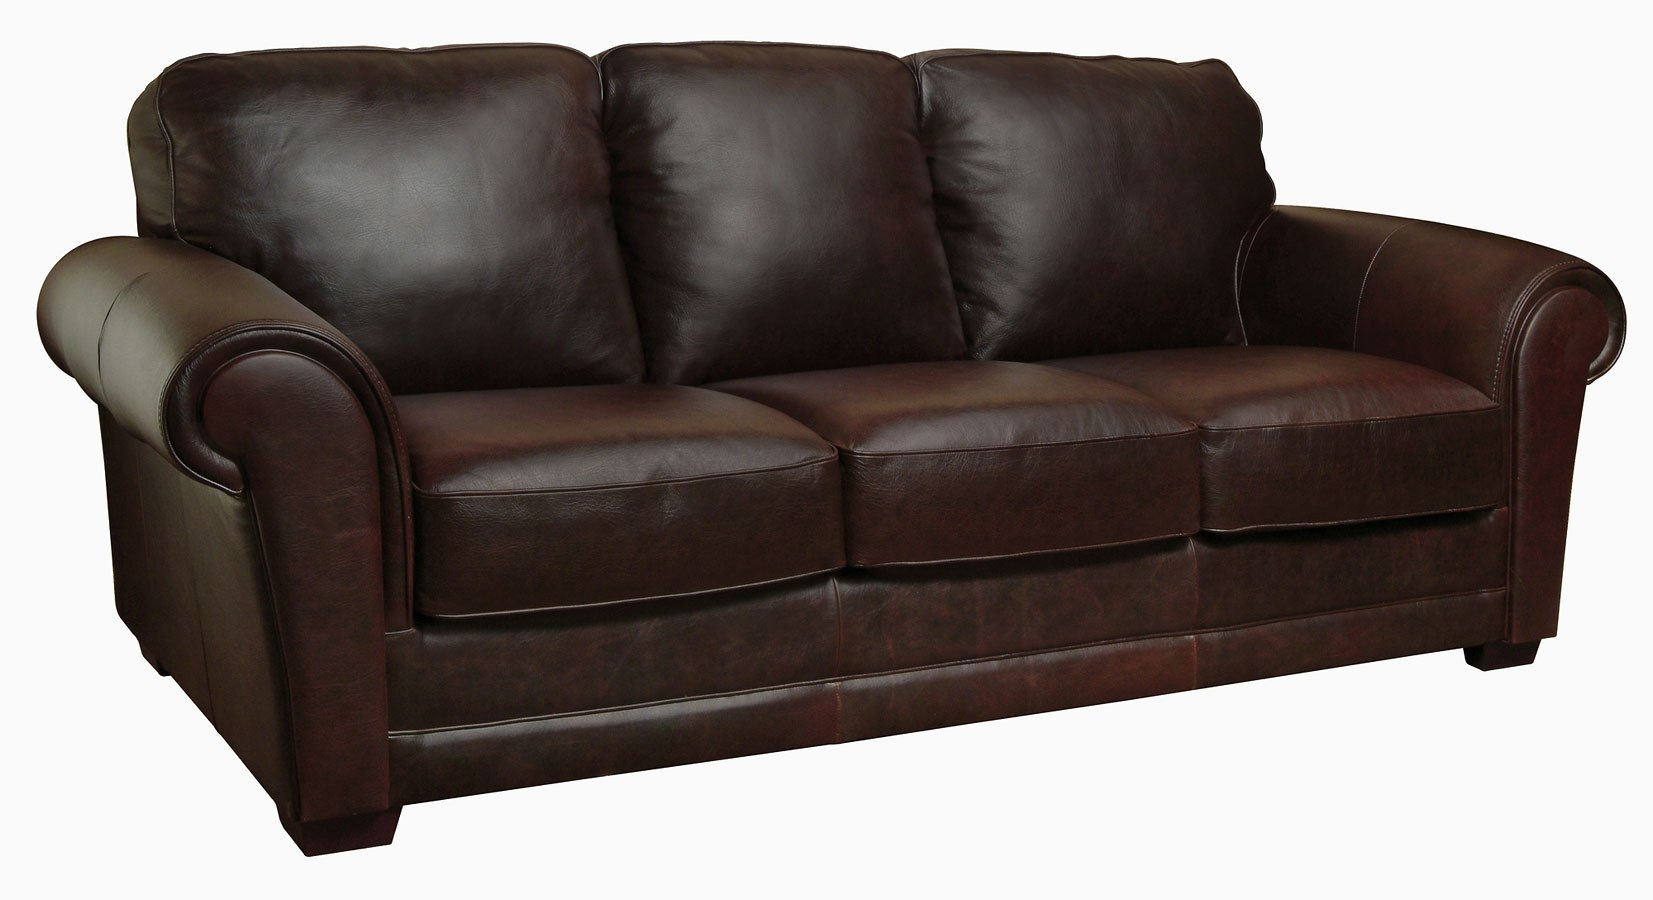 Mark Italian Leather Sofa By Luke